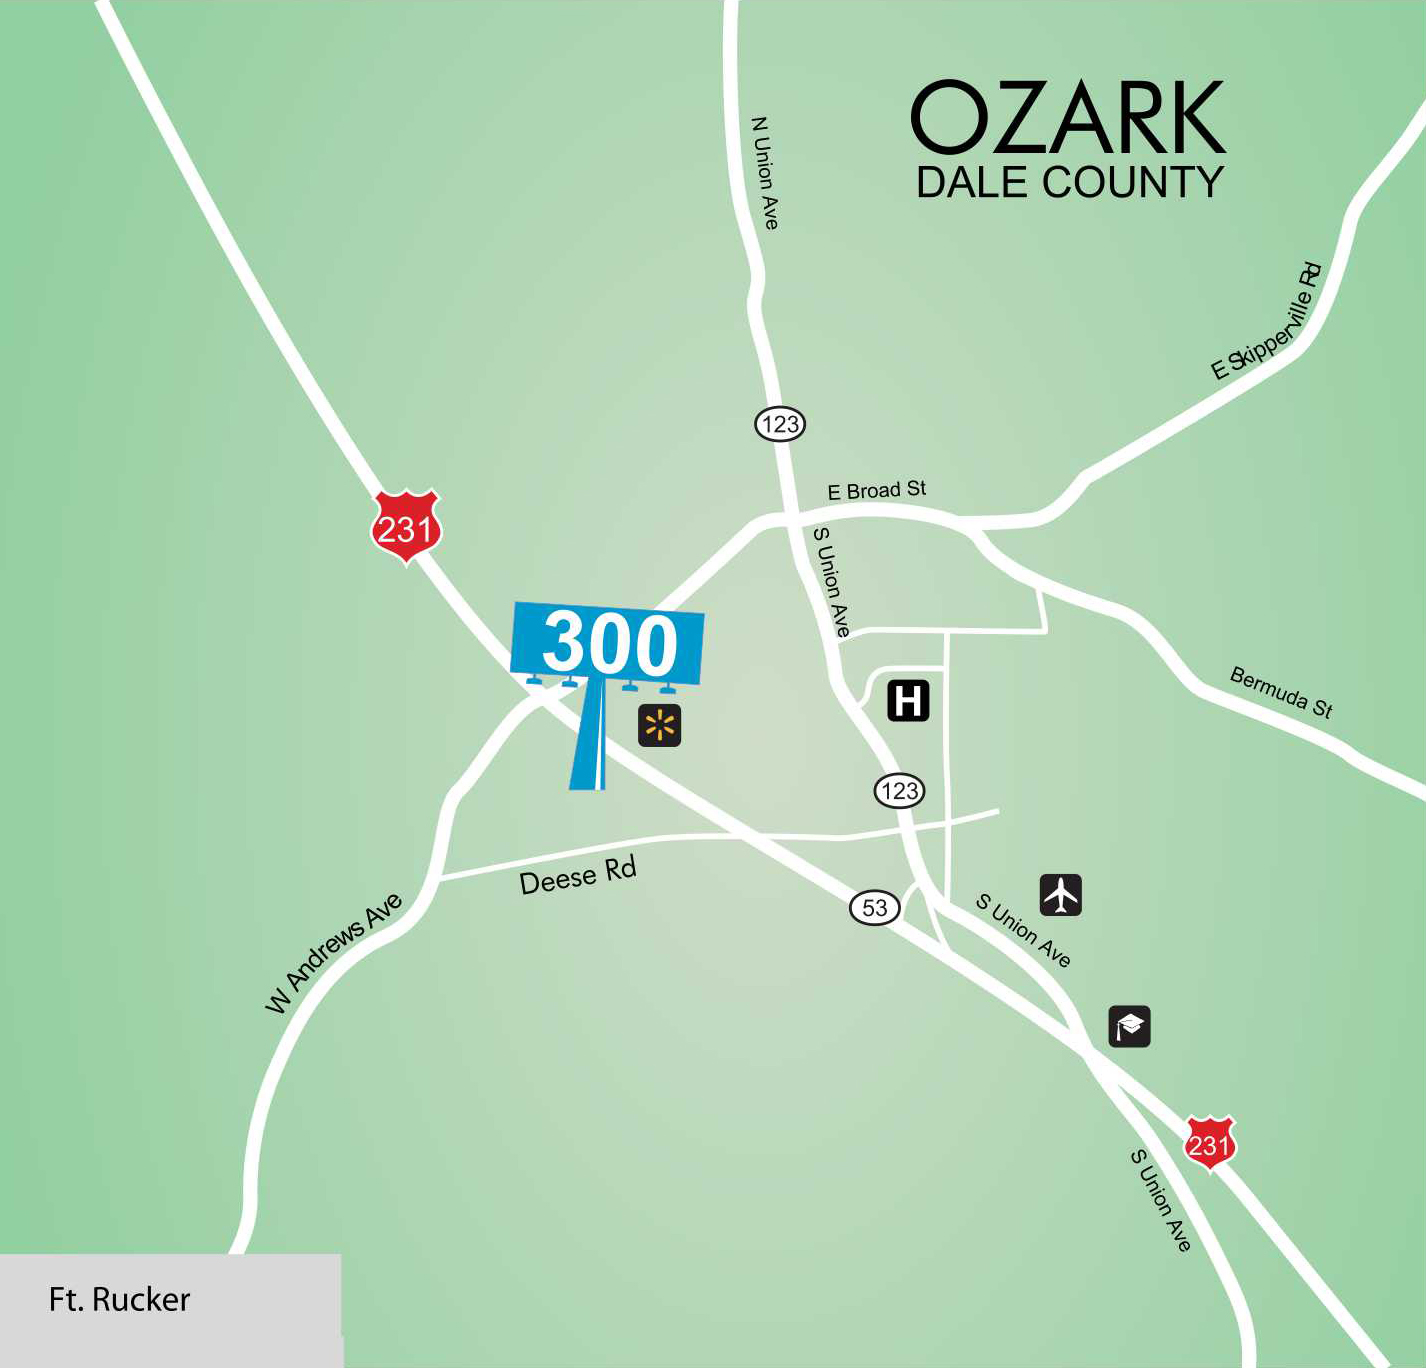 ozarkmap